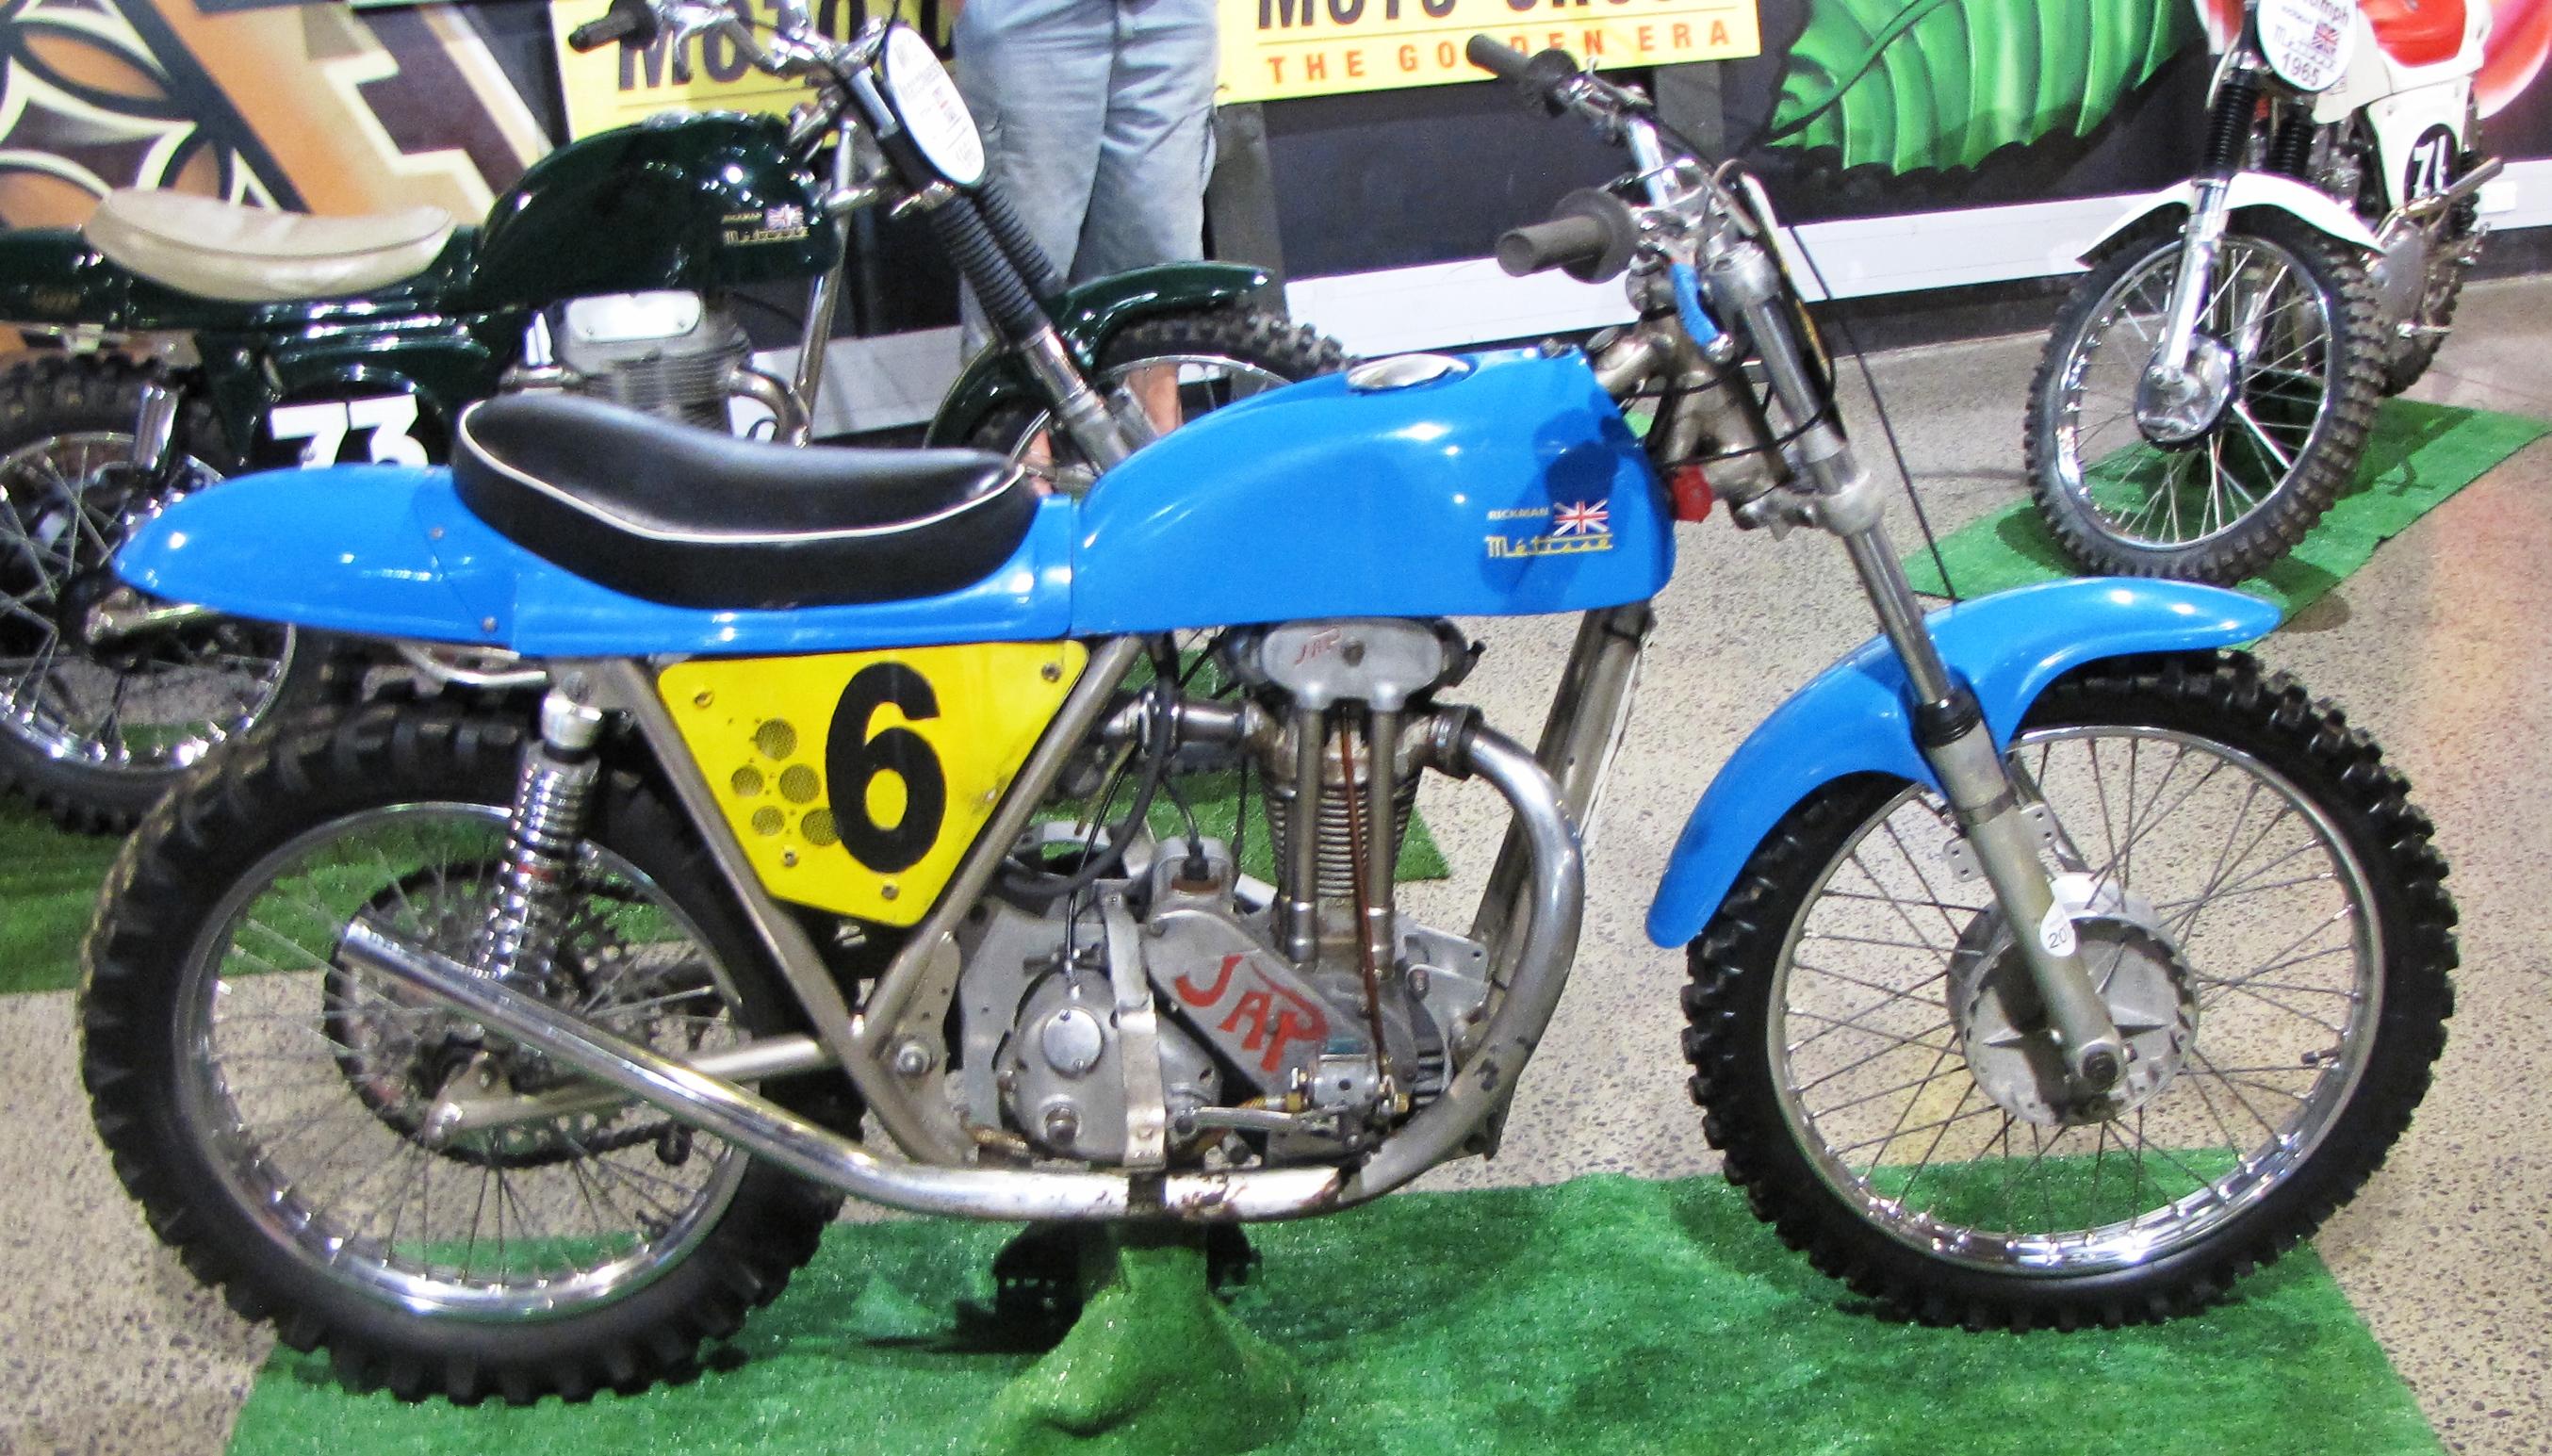 Triumph Motorcycle Insurance Online